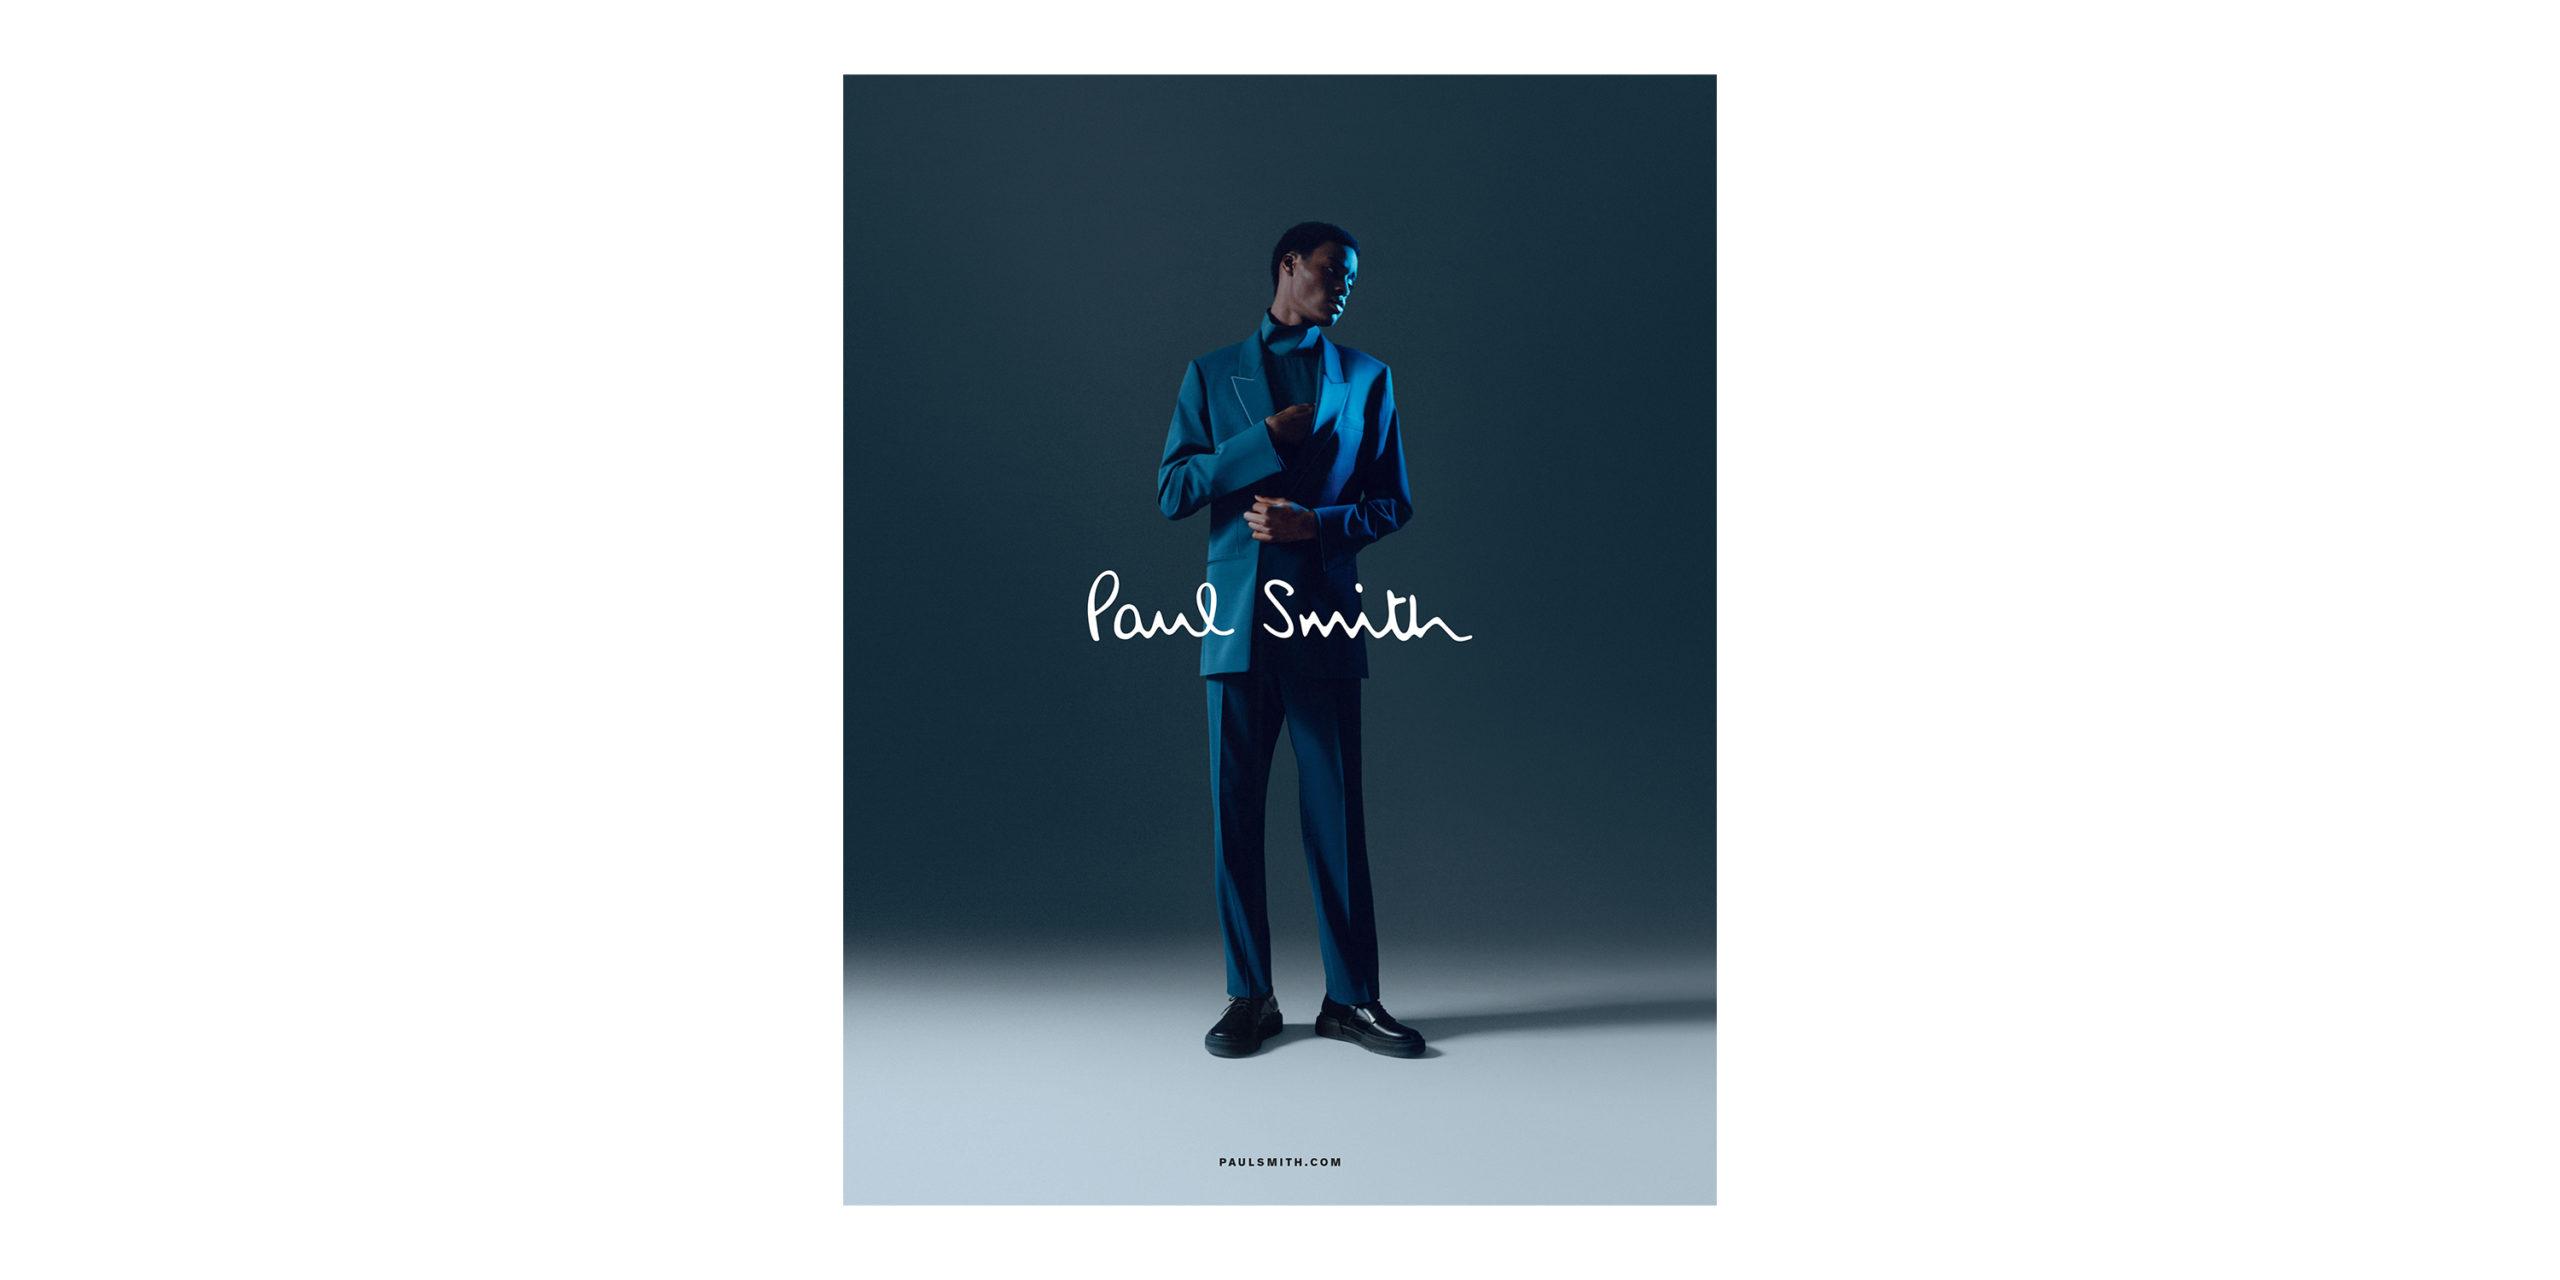 PAUL-SMITH-AW20-CAMPAIGN-BY-GREG-LIN-JIAJIE_1-1